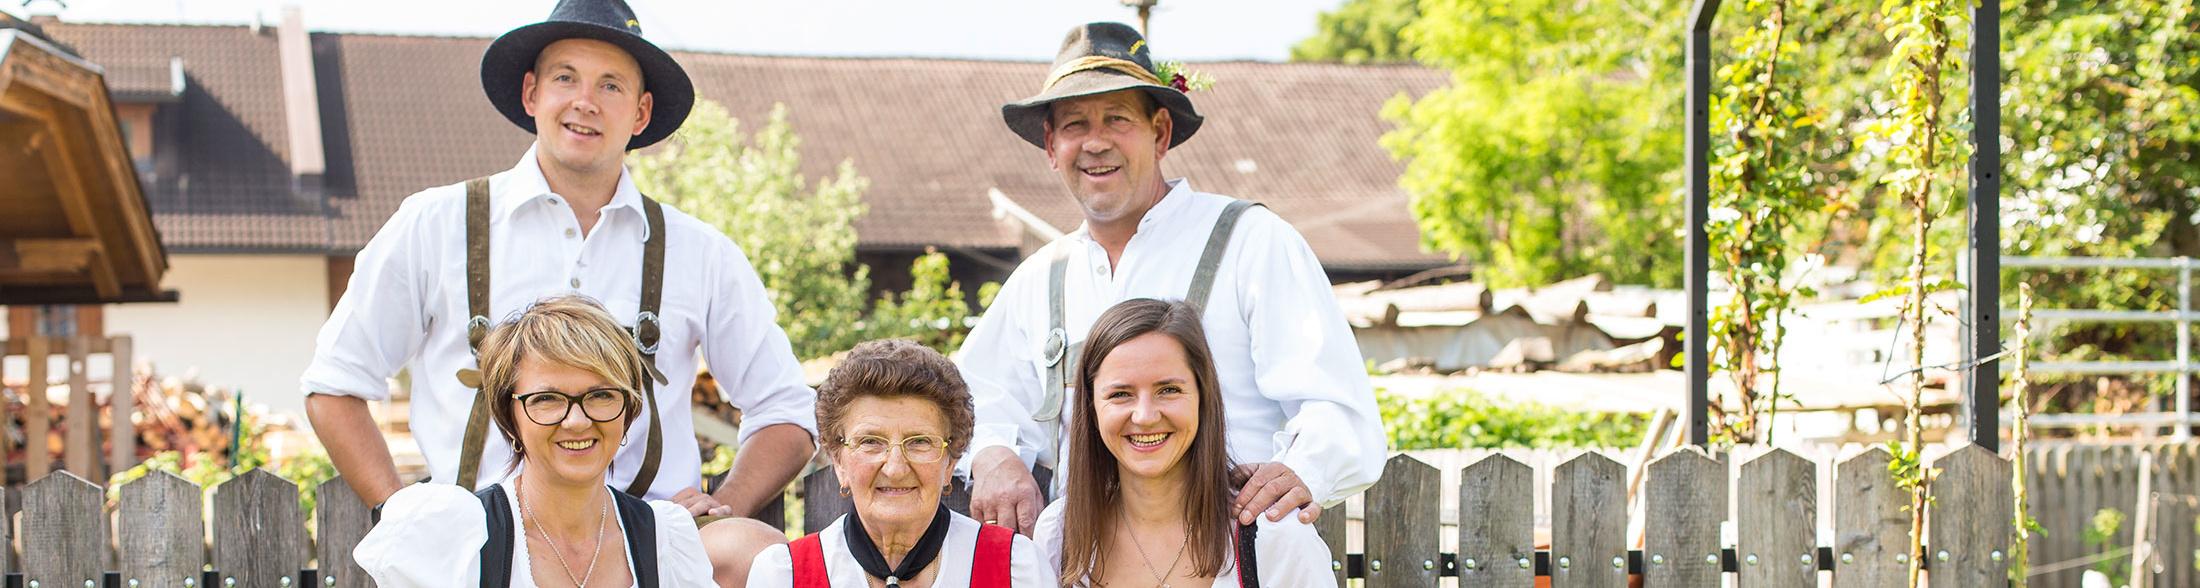 Christlrumerhof Familie Slider